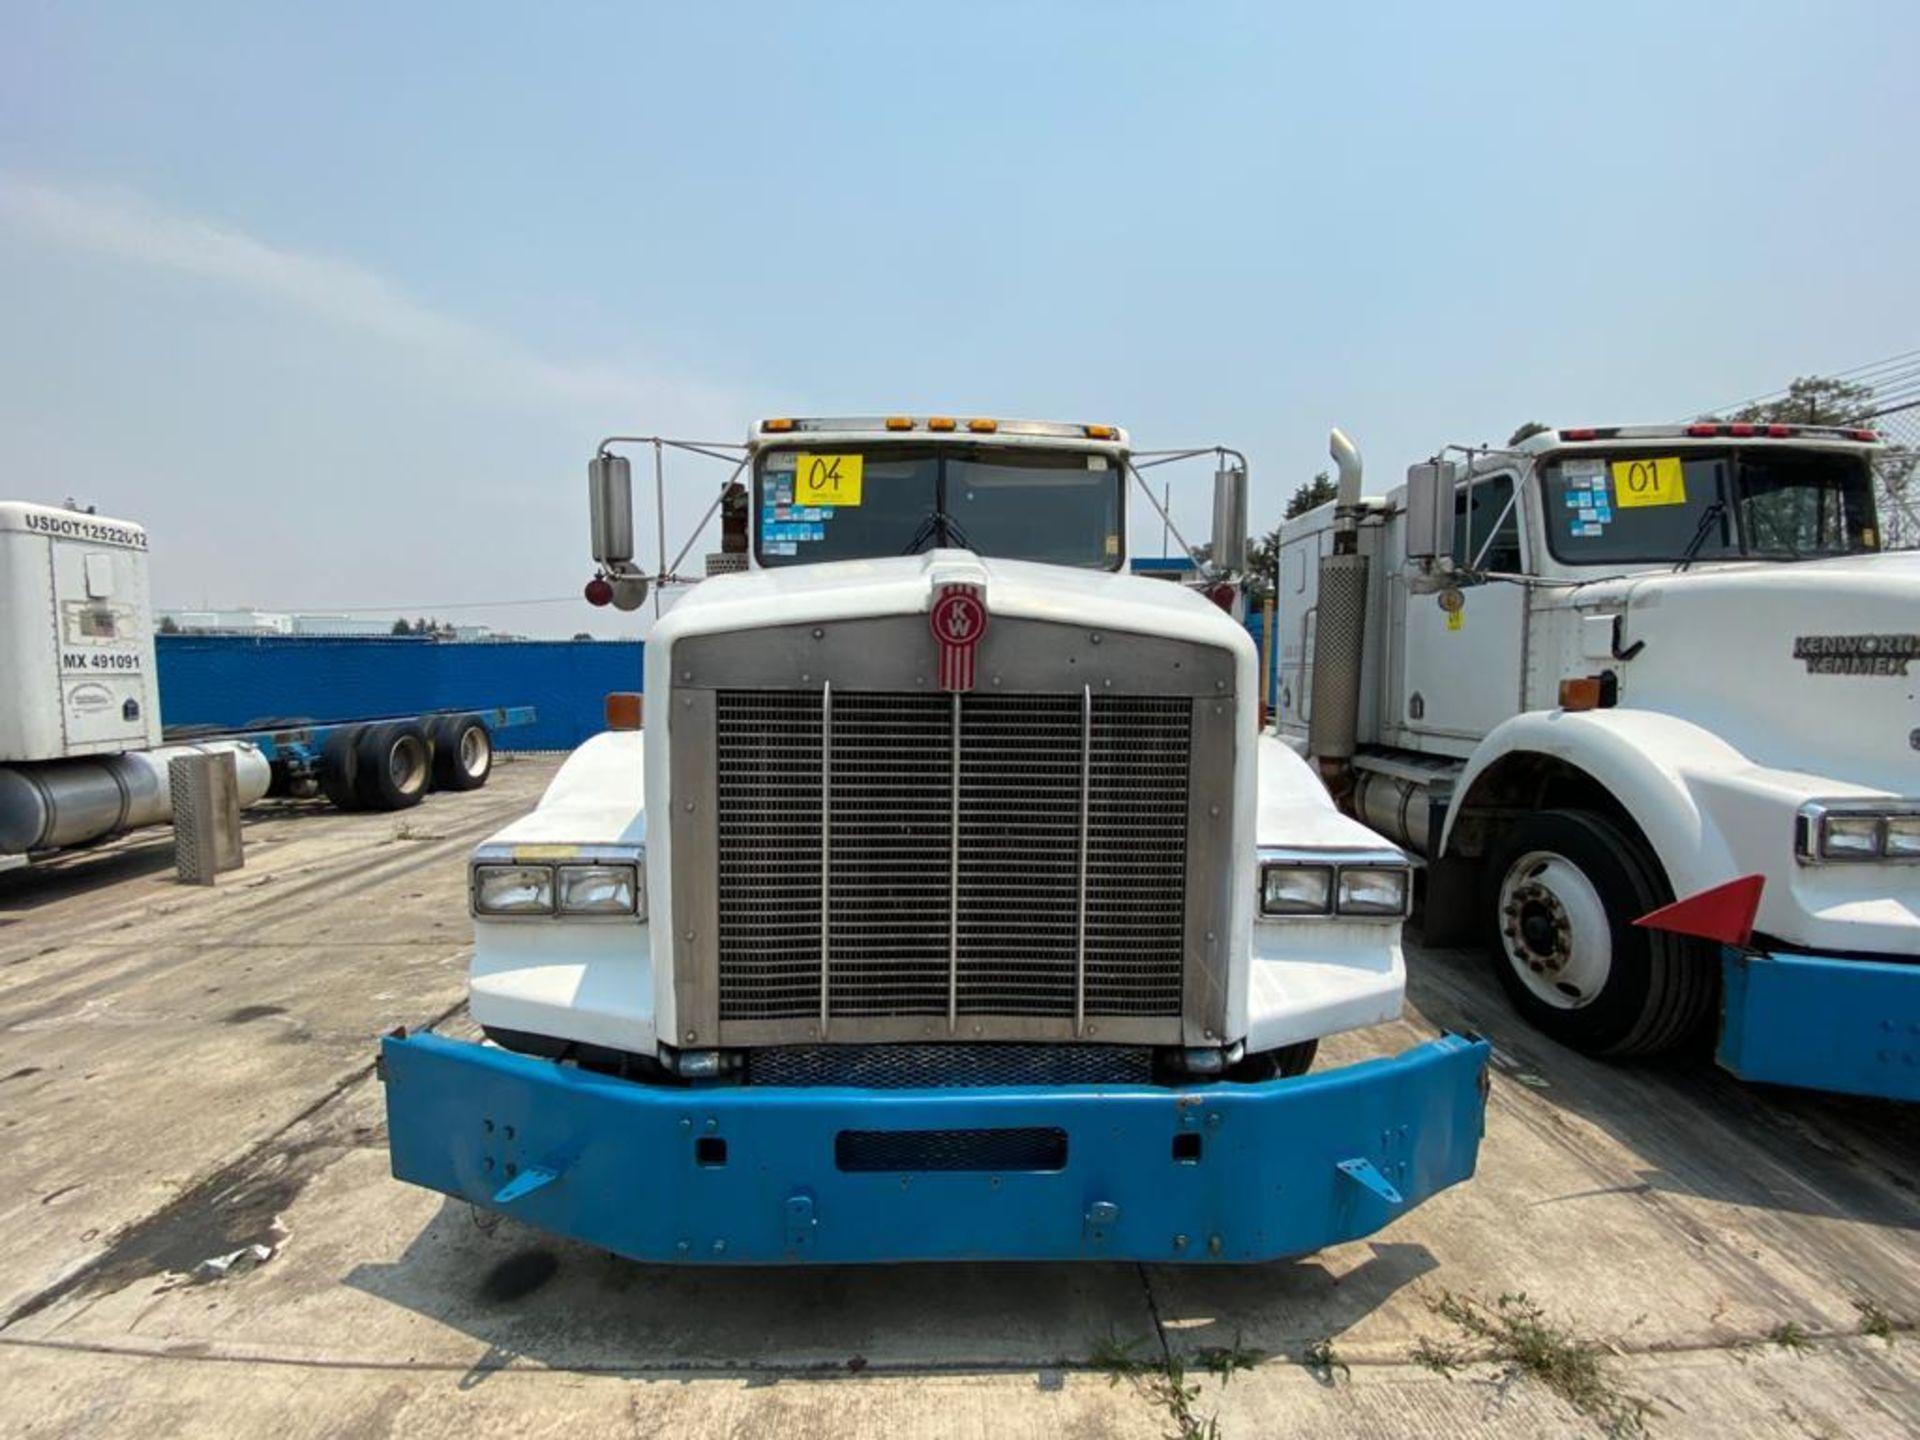 1999 Kenworth Sleeper truck tractor, standard transmission of 18 speeds - Image 5 of 70